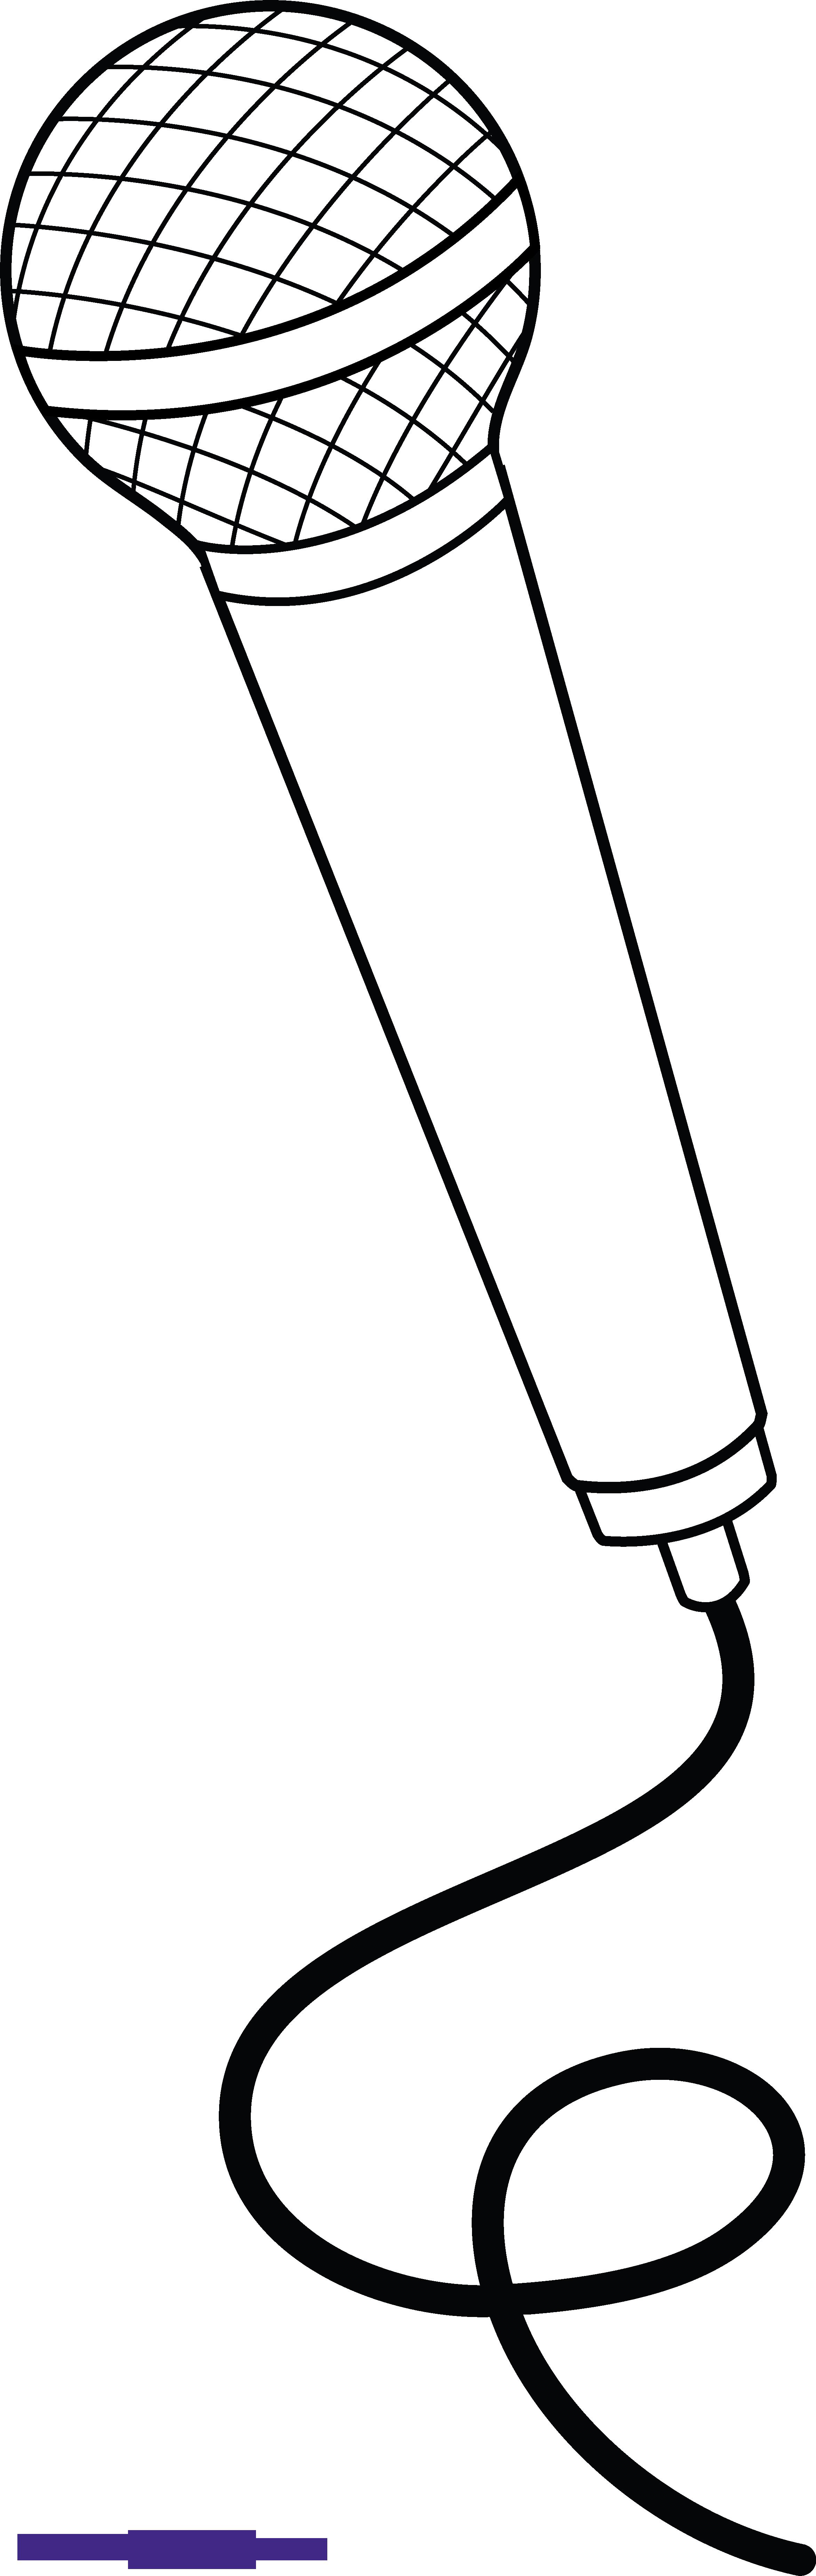 Transparent spider web clipart transparent - Spider Web Clipart Transparent Tumblr - Simple Drawing Of A Microphone